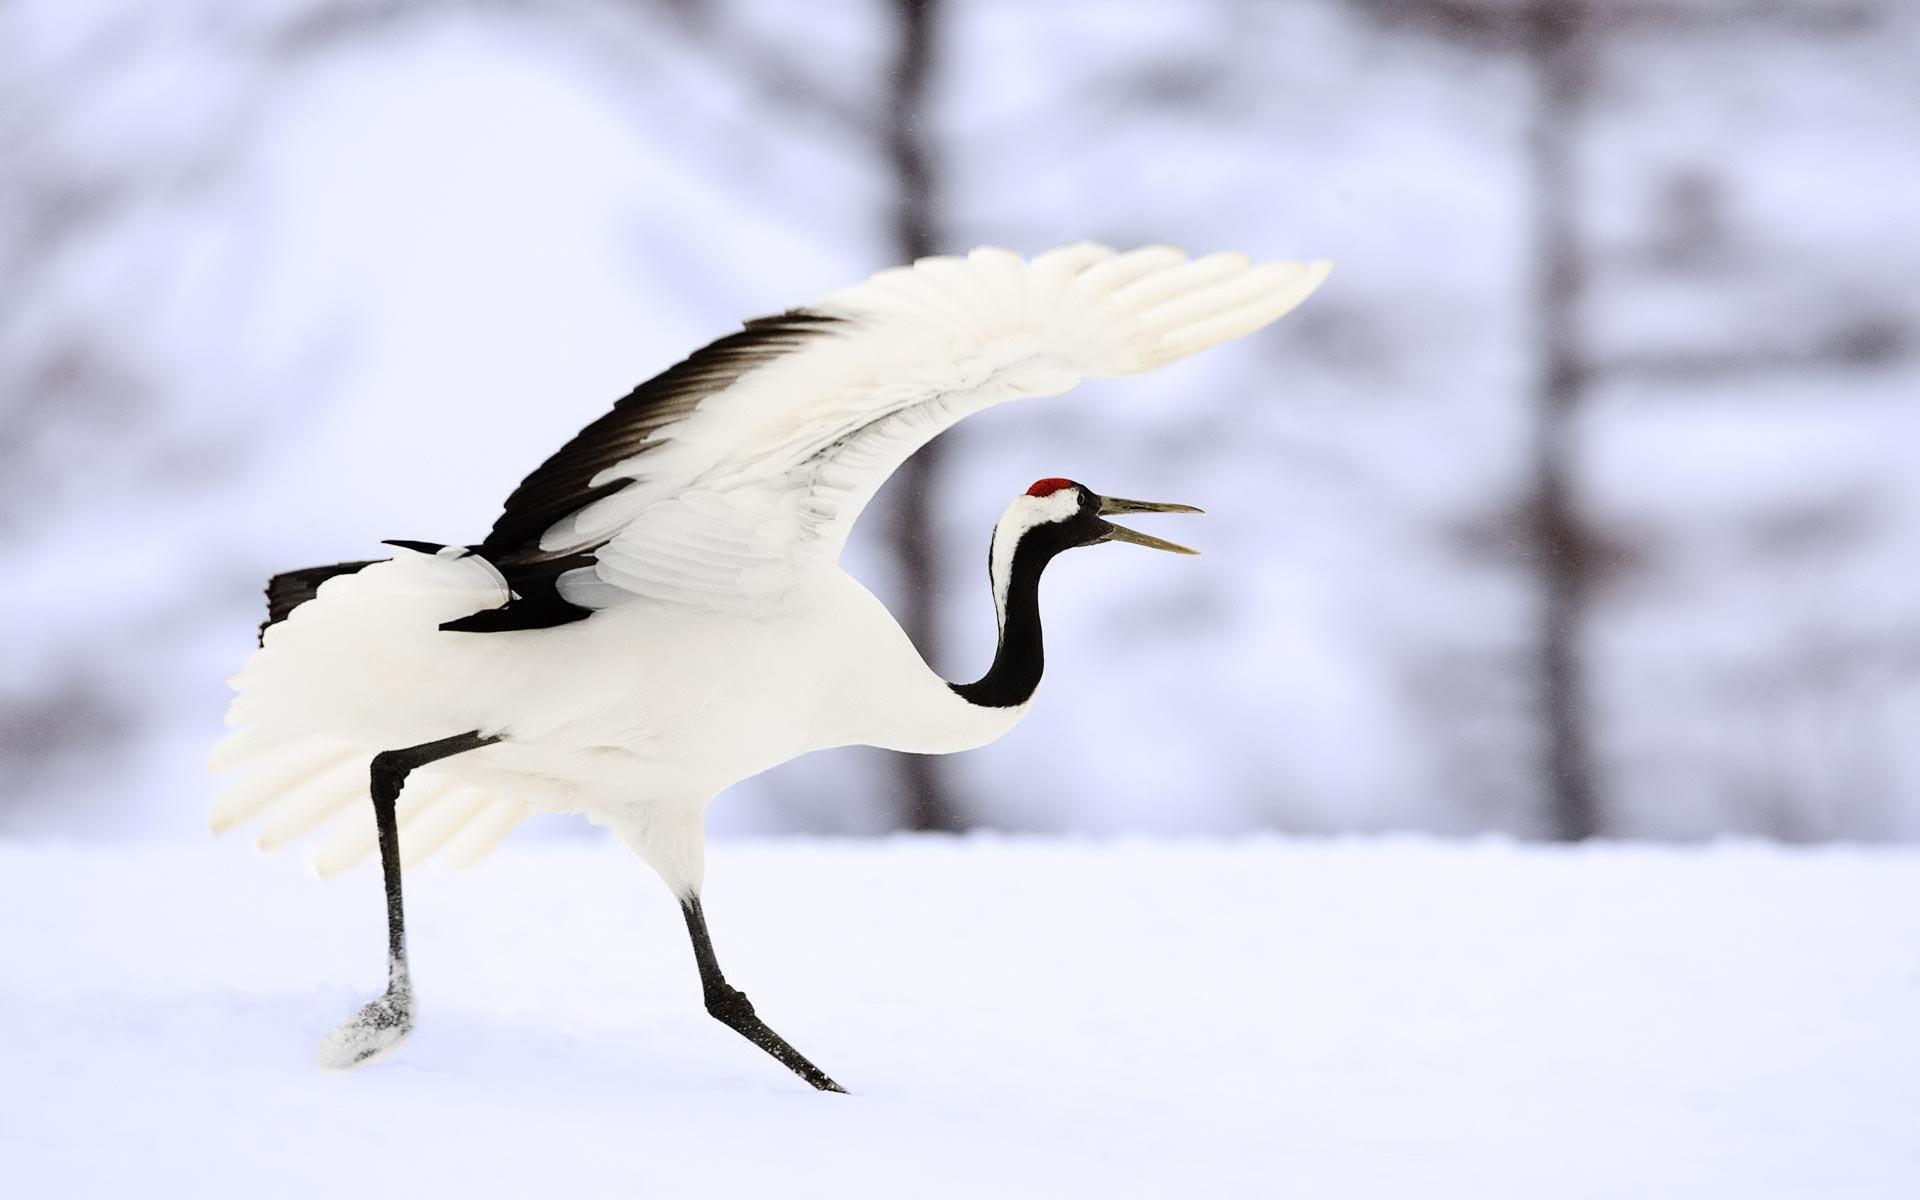 Lovely Crane Bird Wallpaper